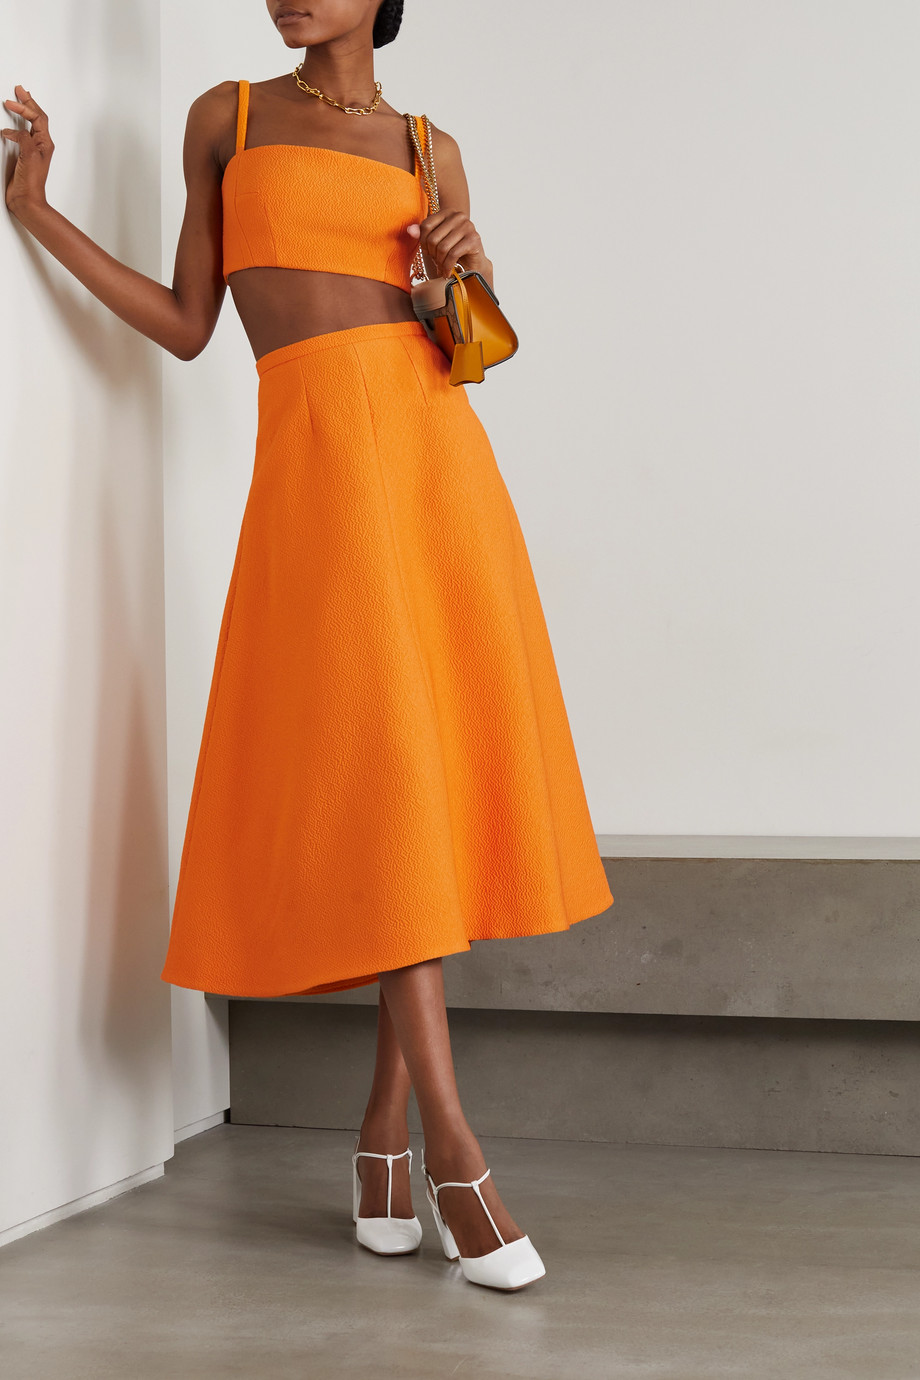 Emilia Wickstead Hertha pleated cloqué midi skirt